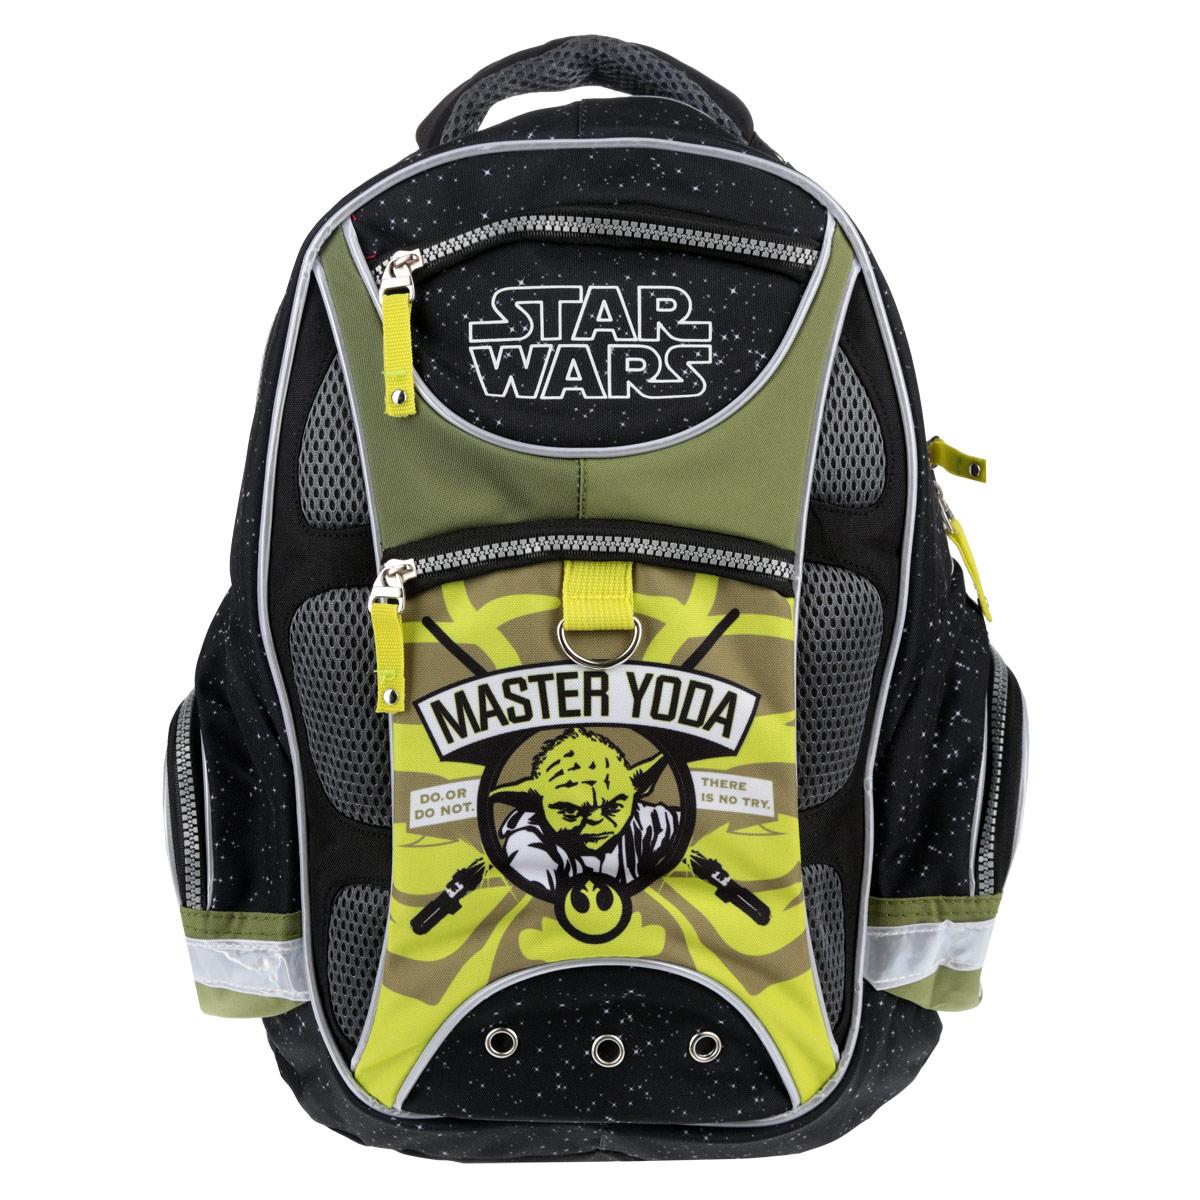 Рюкзак школьный Star Wars Master Yoda, цвет: черный, зеленый аксессуар ring star dream master area black 109954